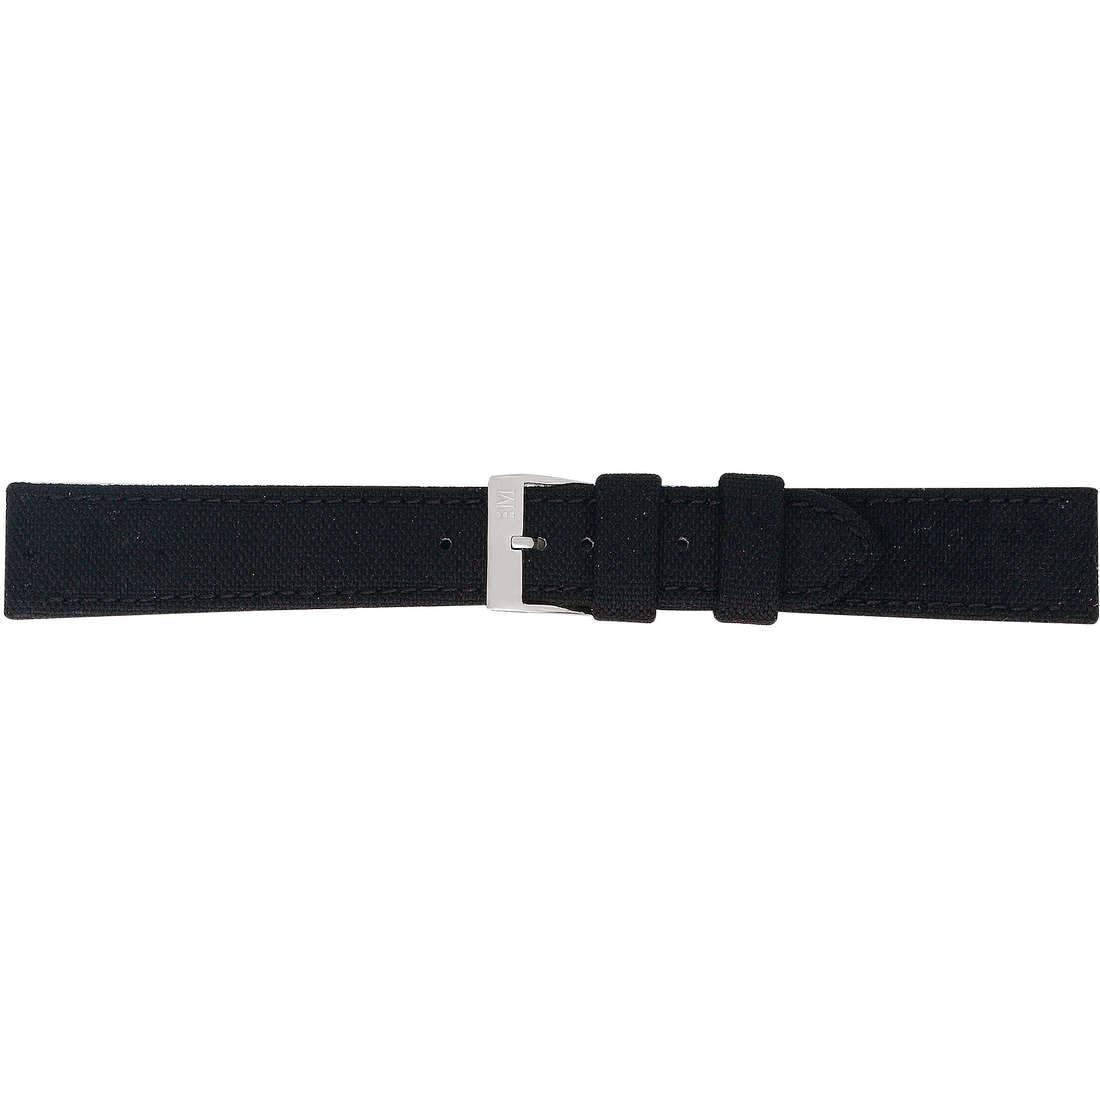 watch watch bands watch straps man Morellato Linea Sport A01U2779110019CR22